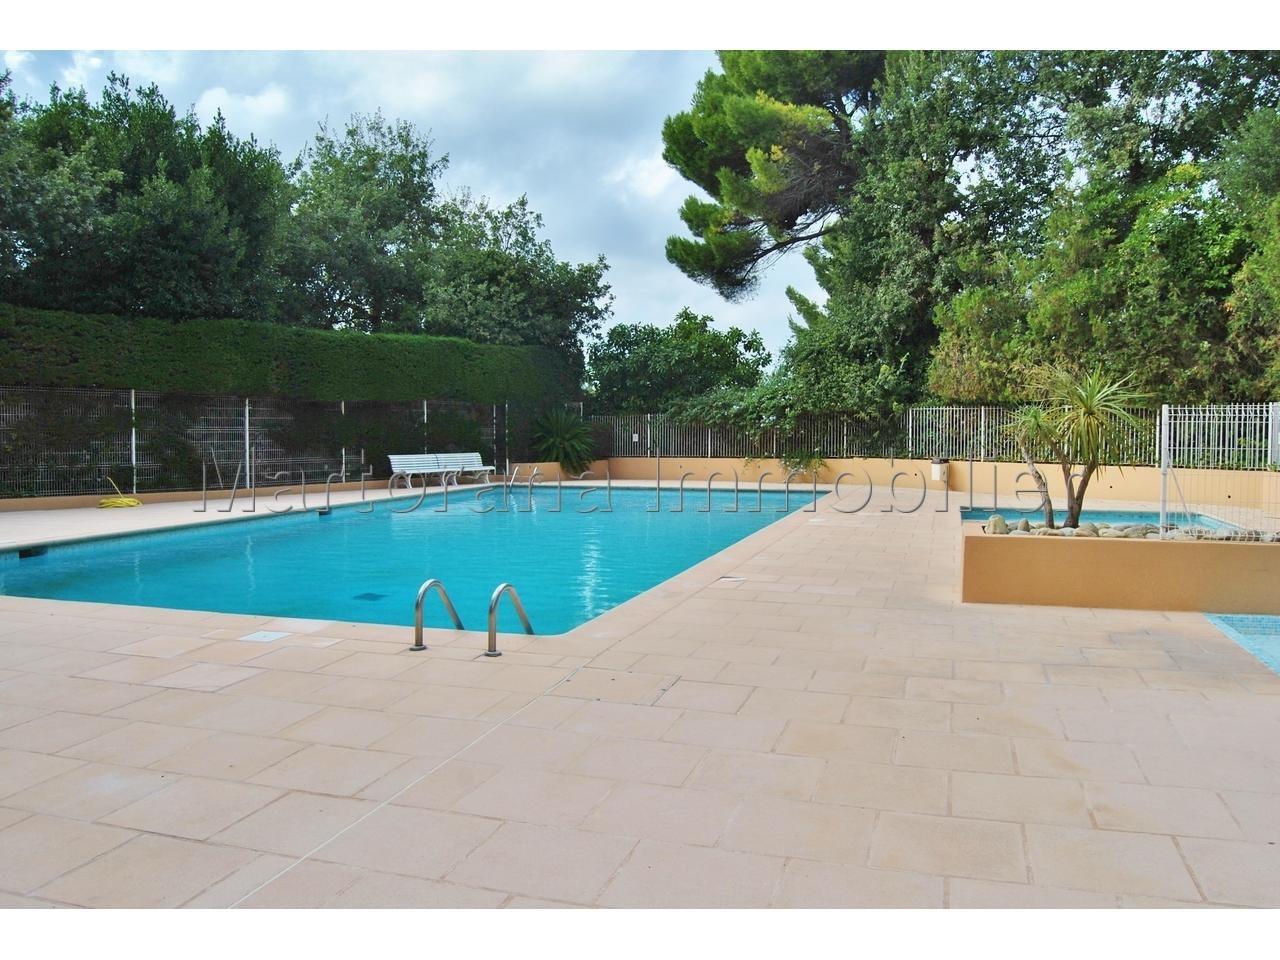 Studio meublé avec terrasse et piscine